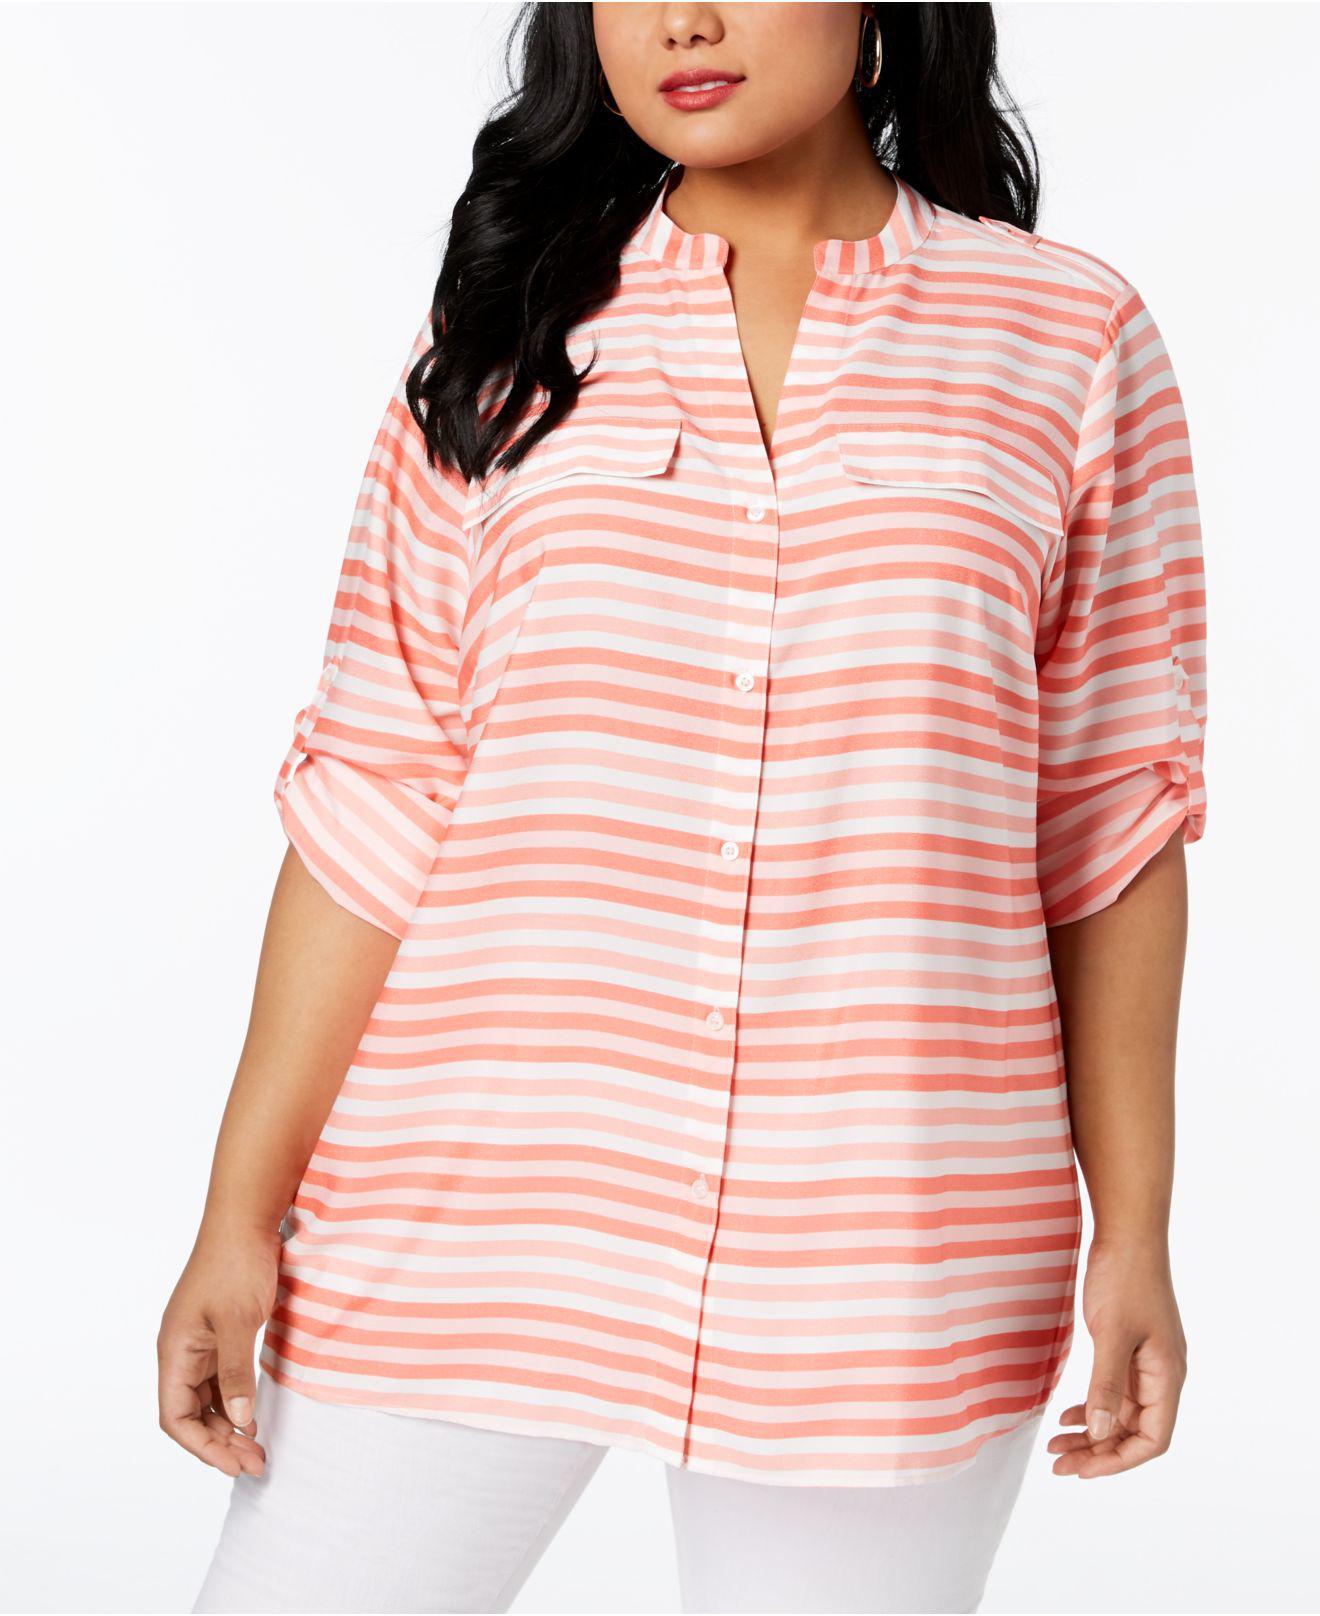 48de38f458c Calvin Klein Plus Size Striped Tunic Shirt in Pink - Lyst